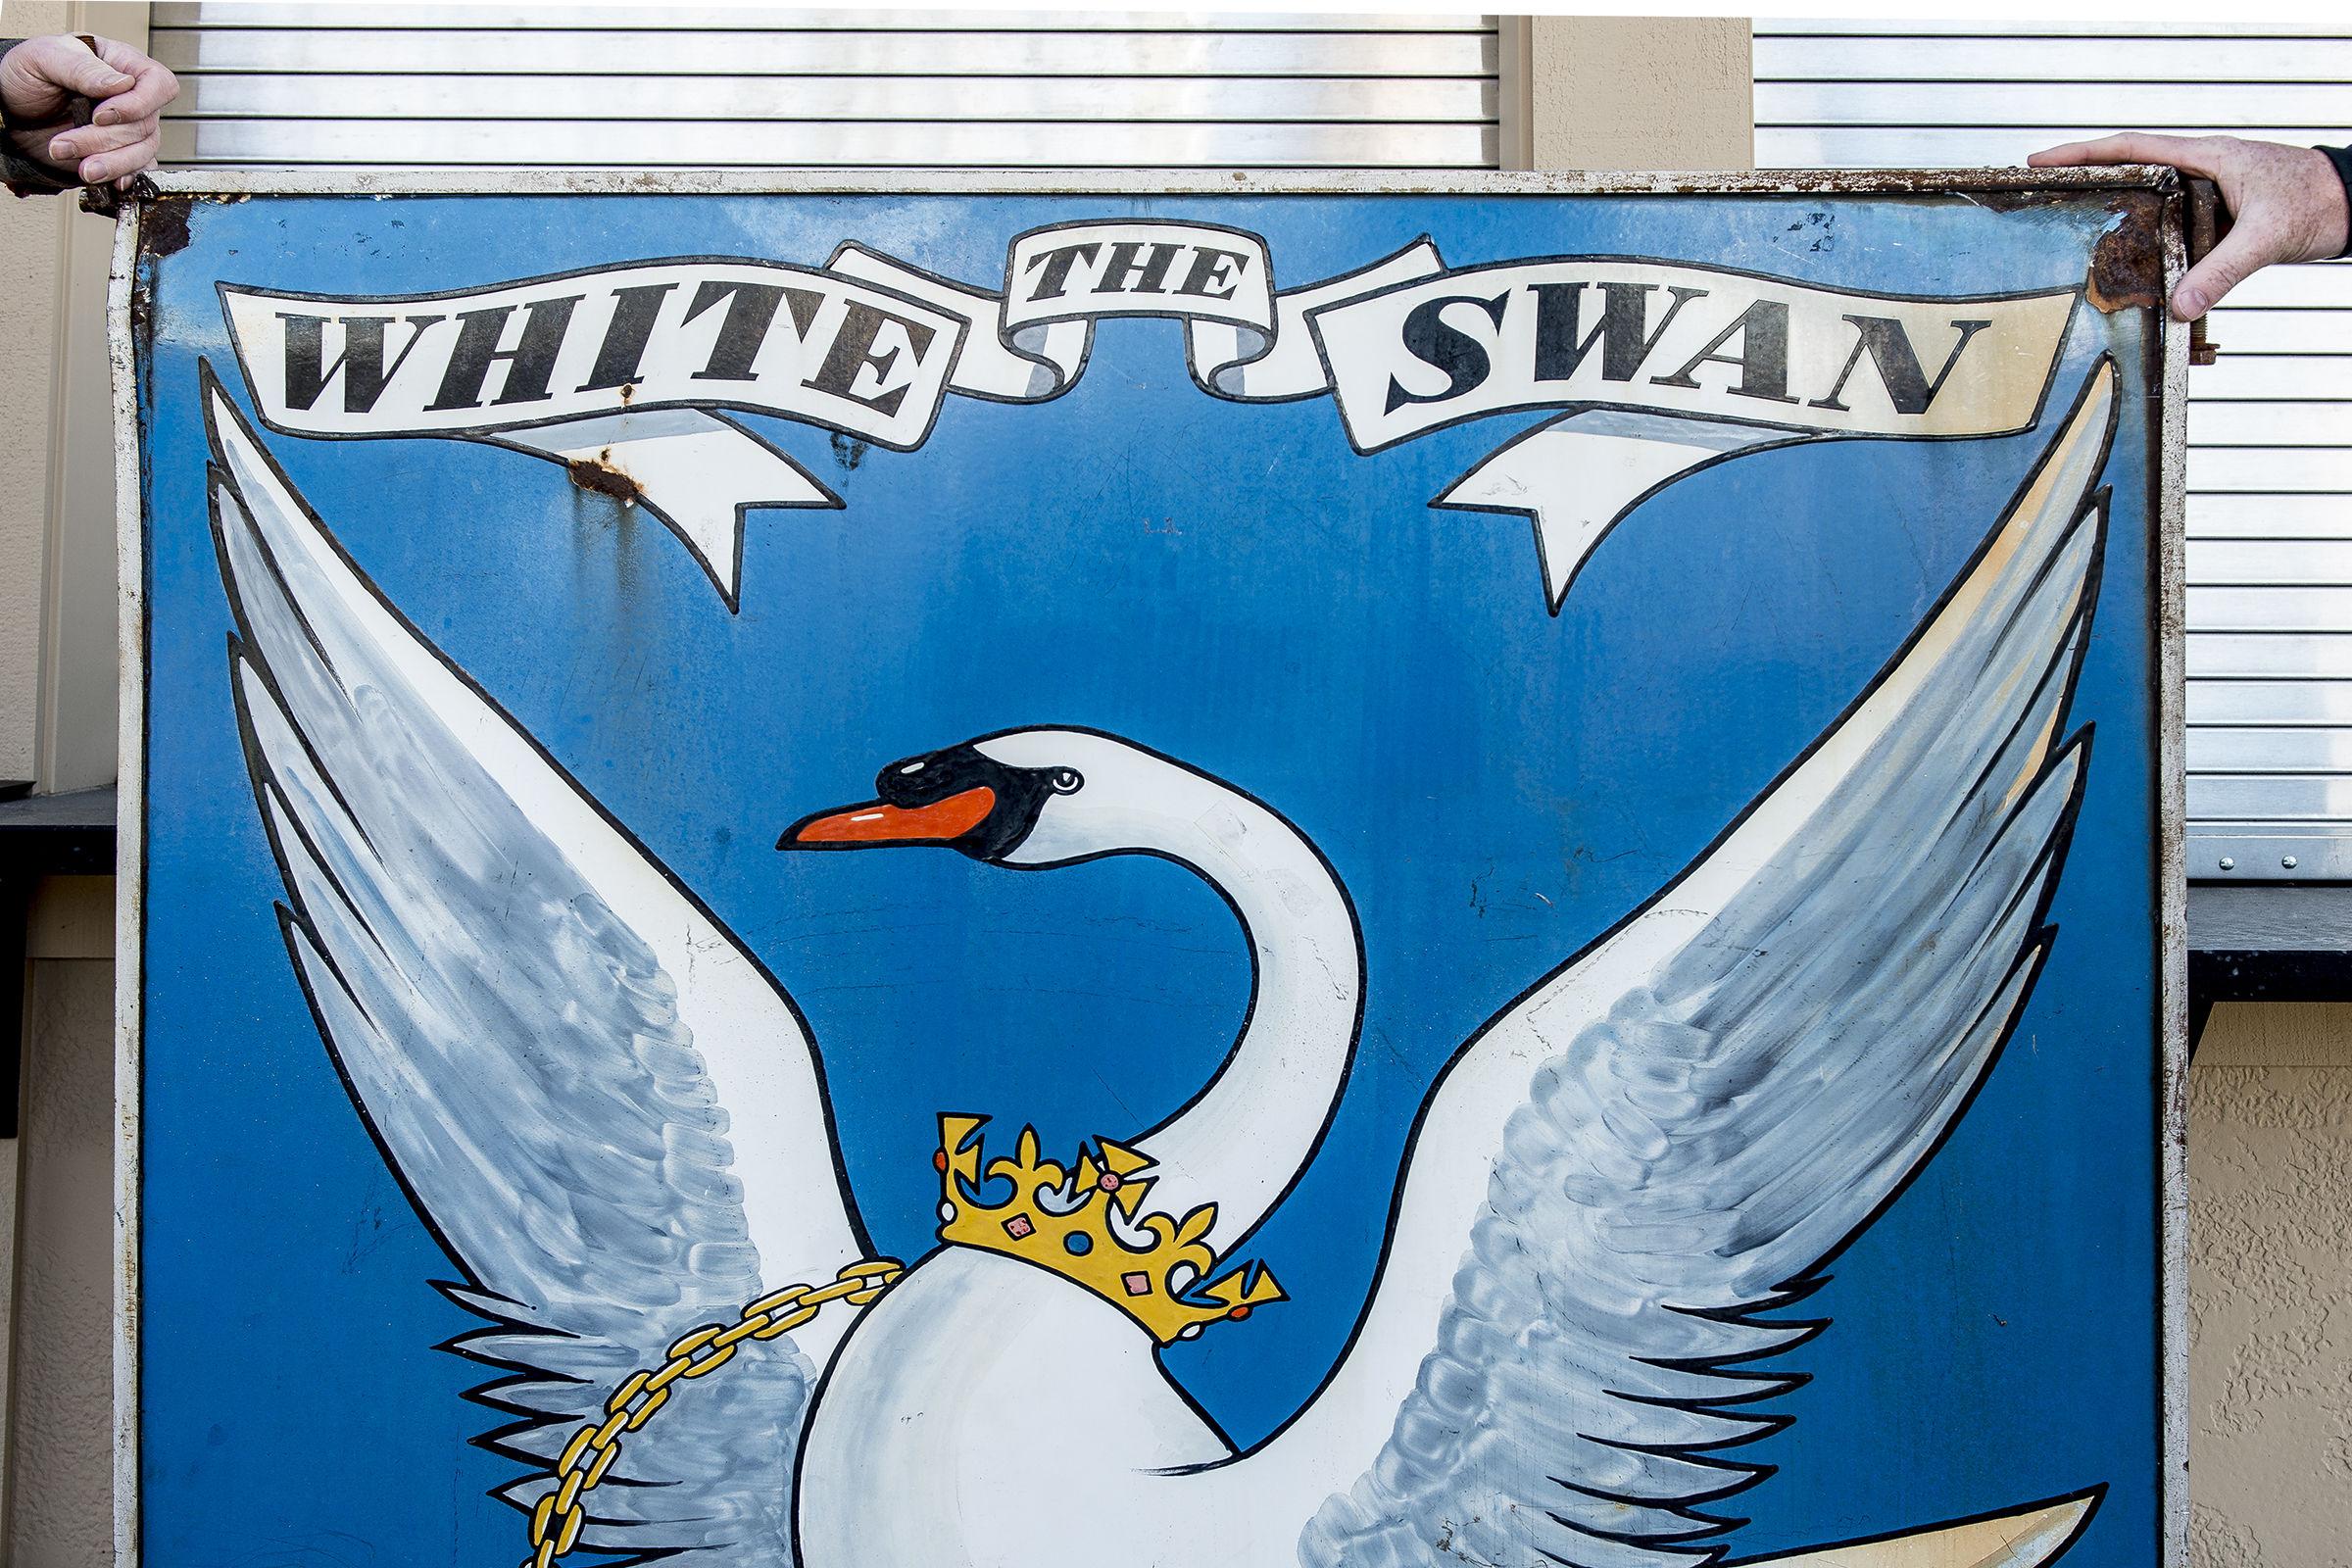 The white swan public house ufjlhj